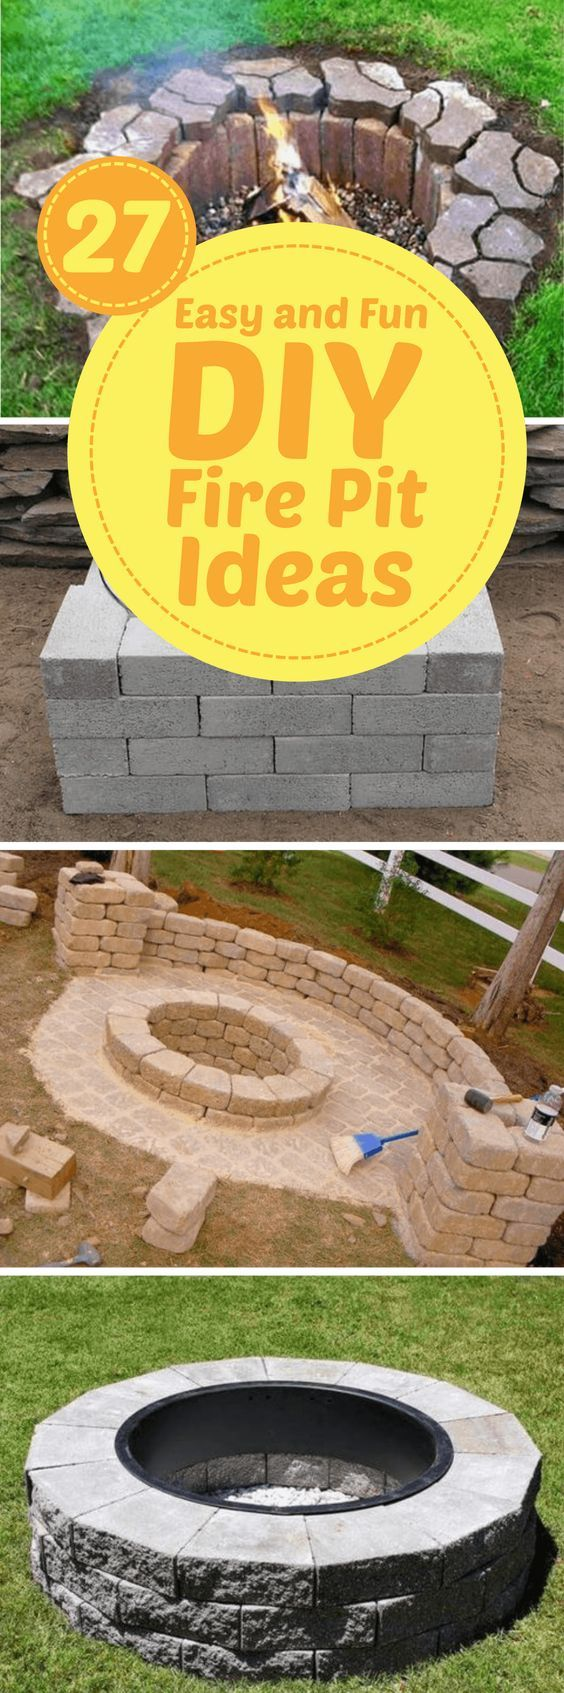 582 best ZAHRADA images on Pinterest | Gardening, Backyard ideas and ...